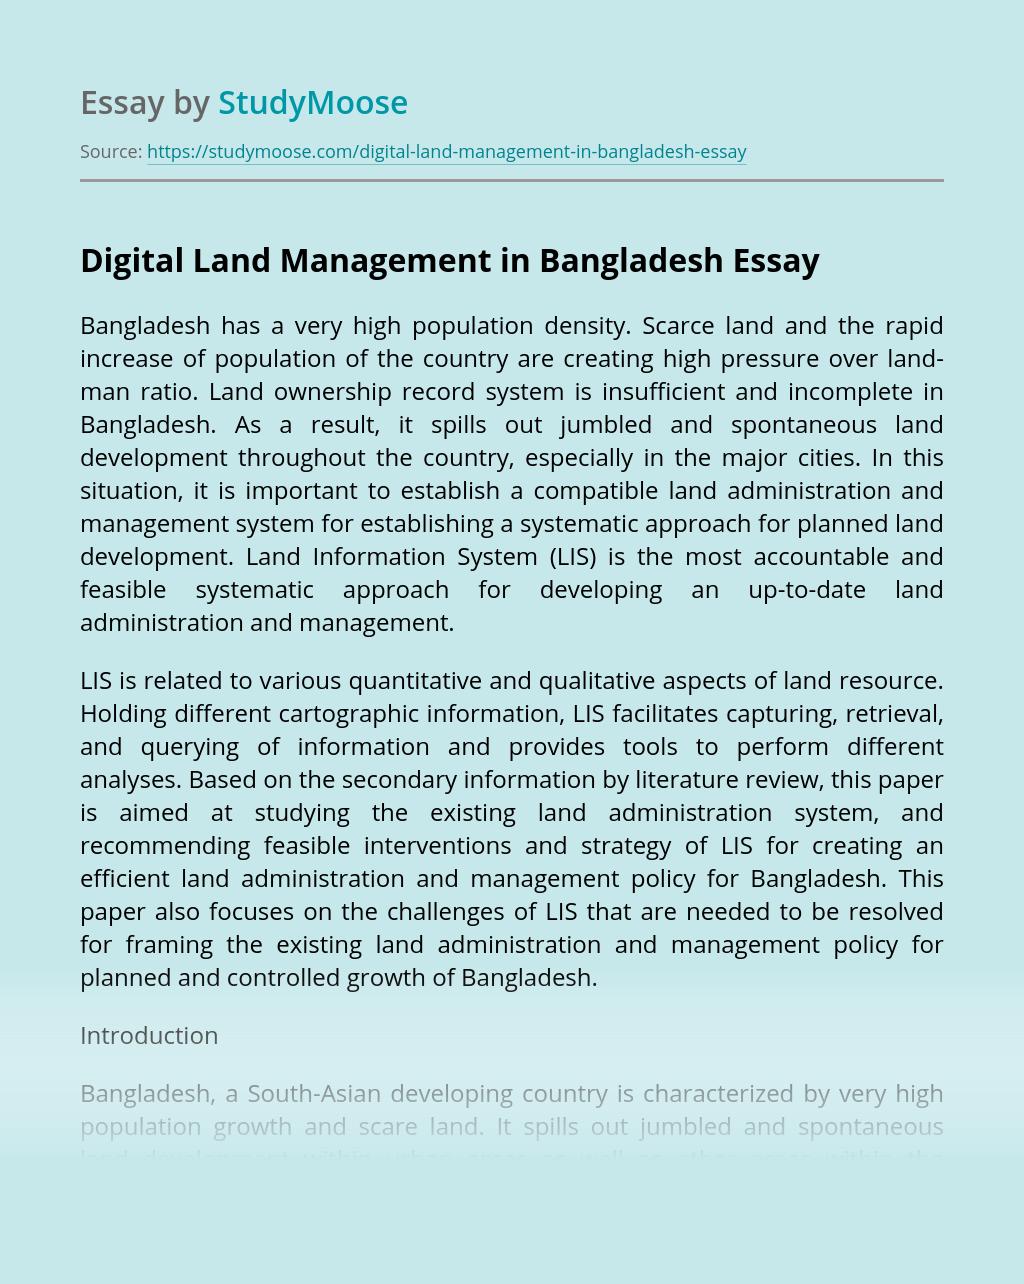 Digital Land Management in Bangladesh